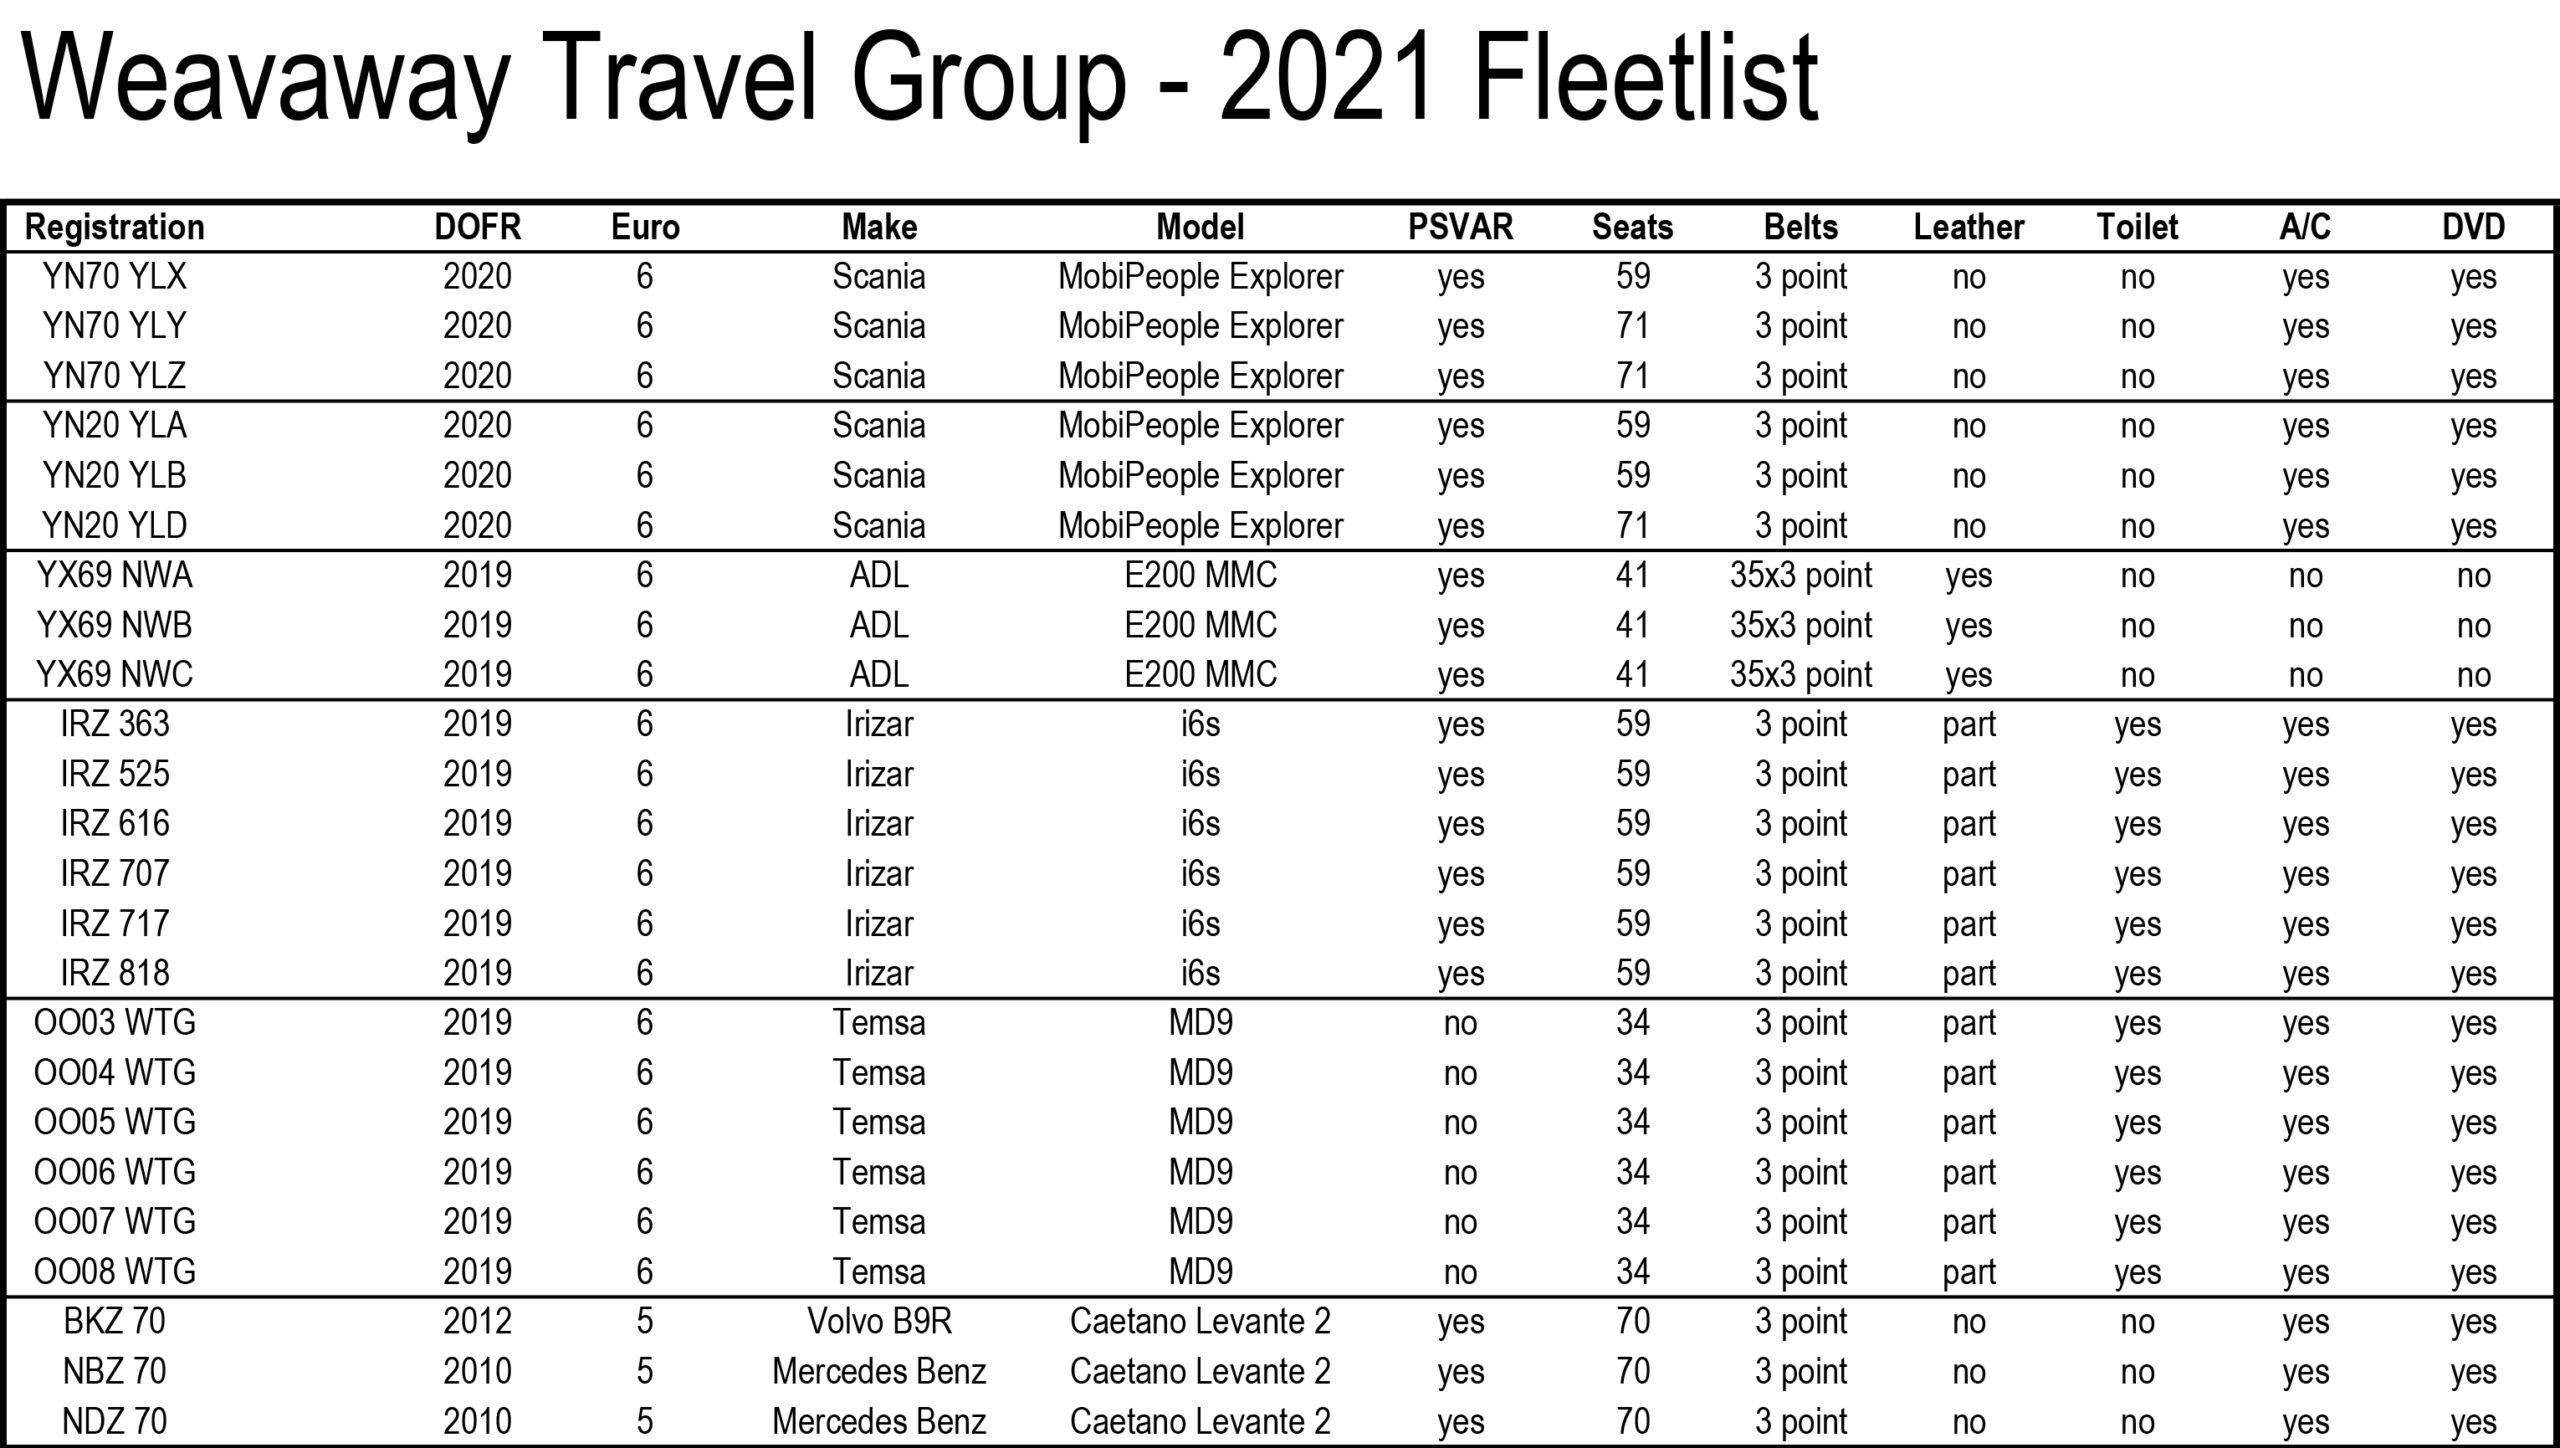 2021 fleetlist